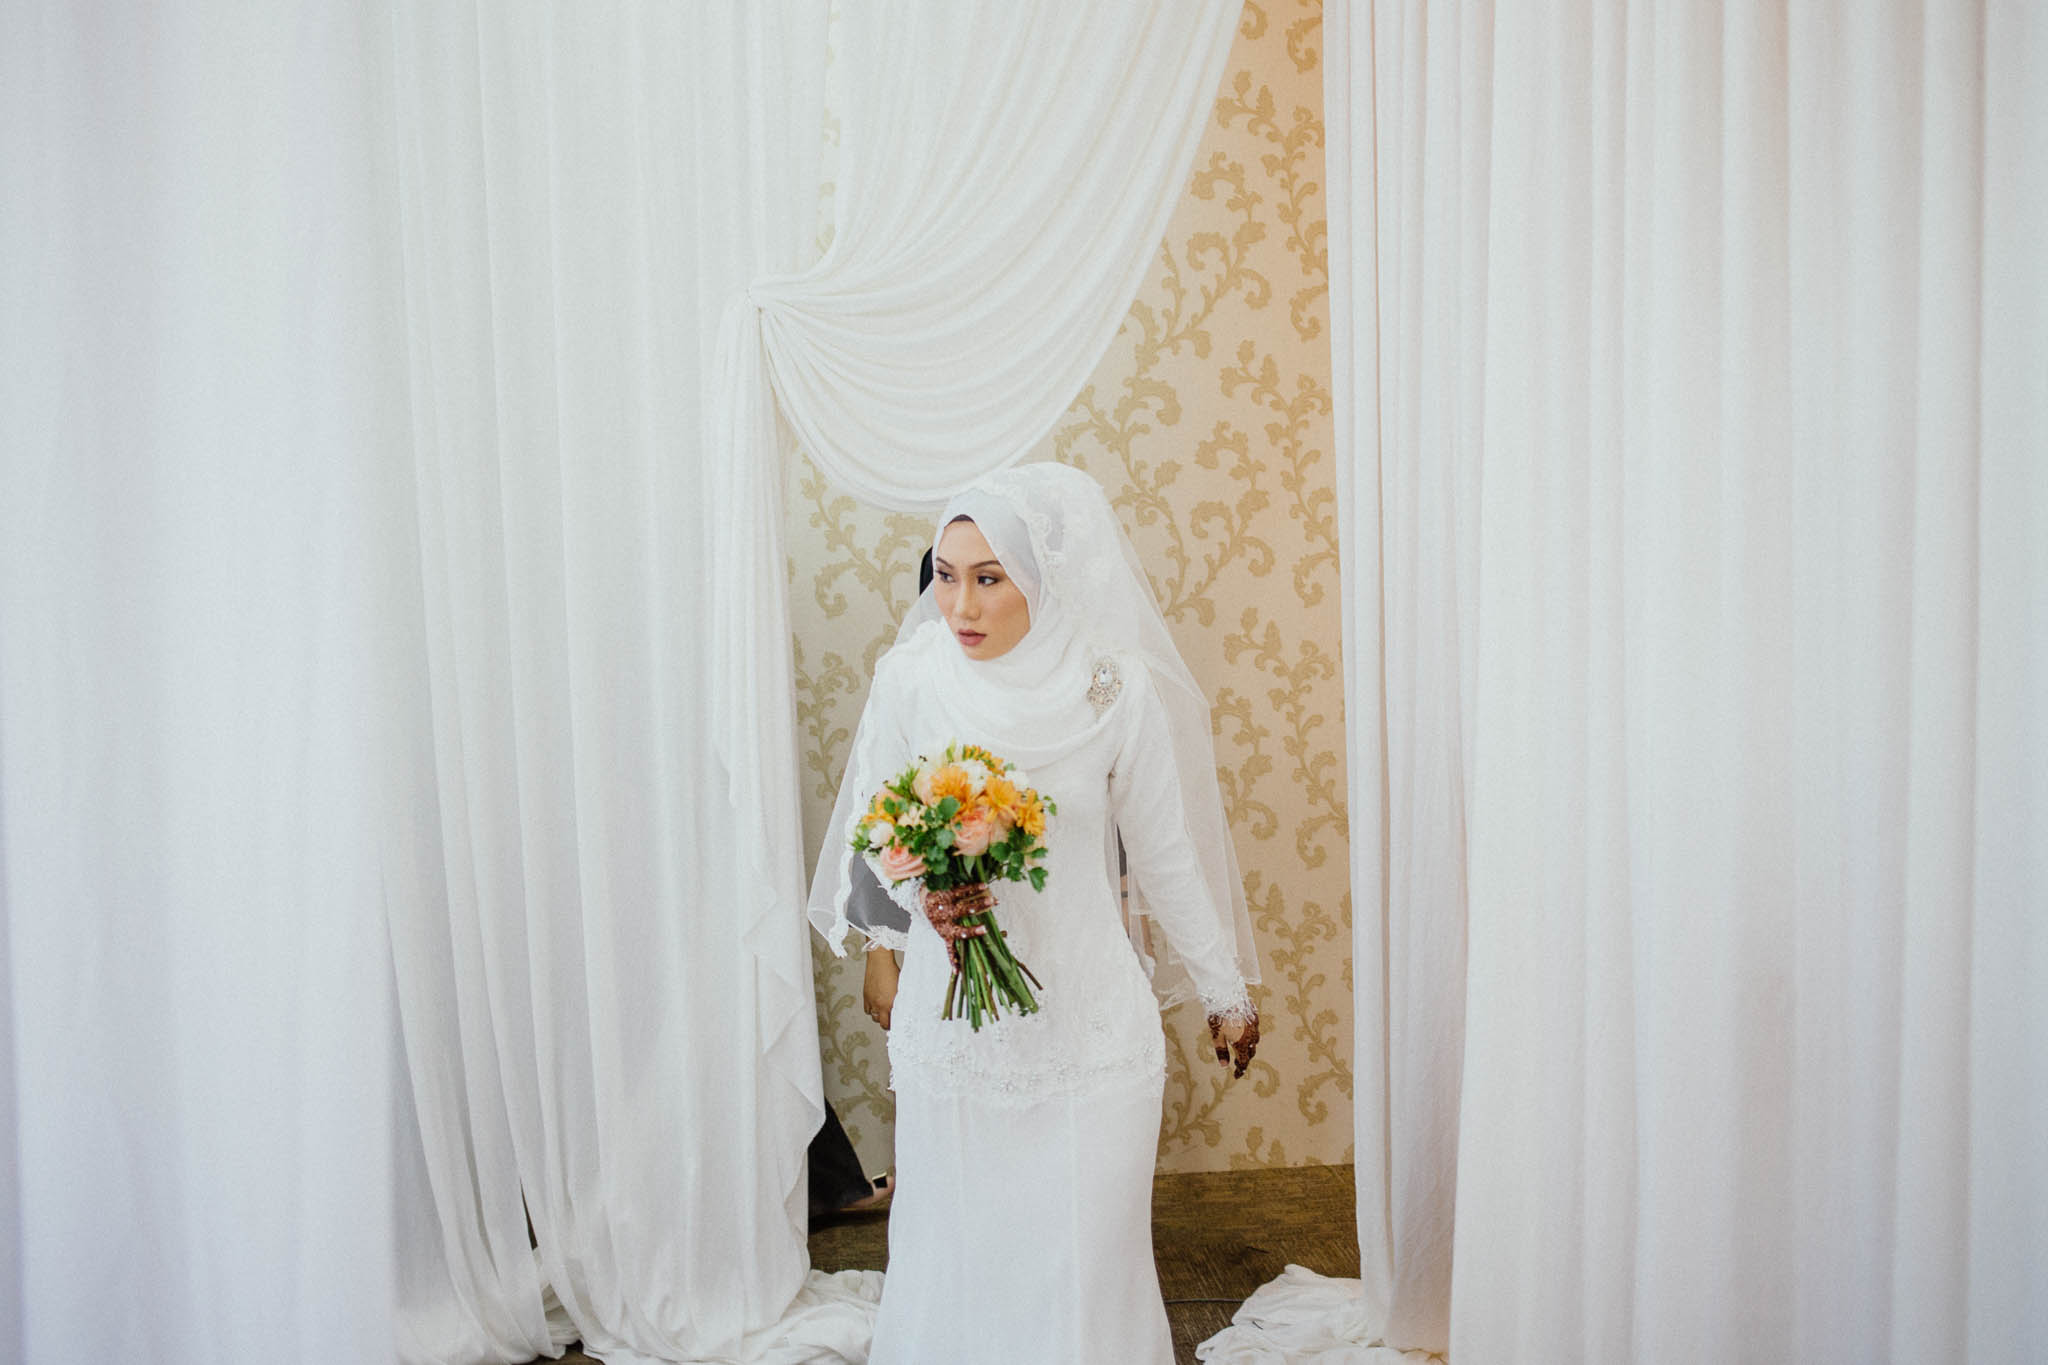 singapore-wedding-photographer-wedding-nufail-addafiq-014.jpg